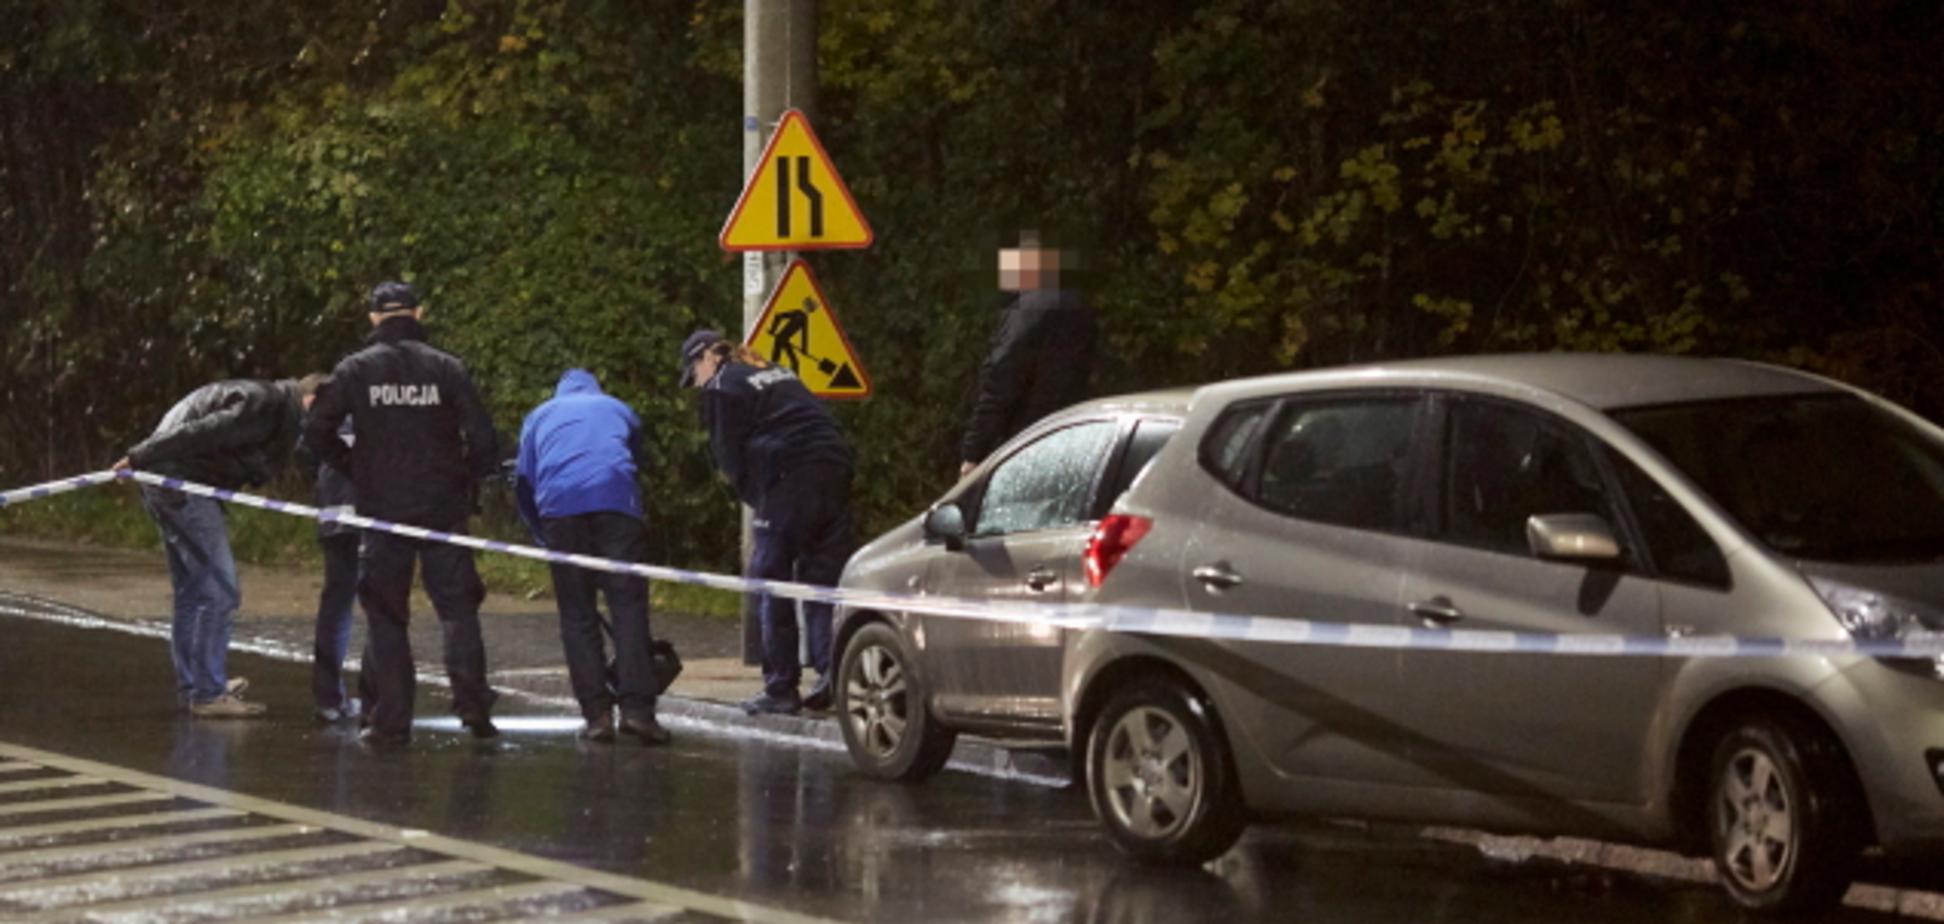 Вбивство українця в Гданську